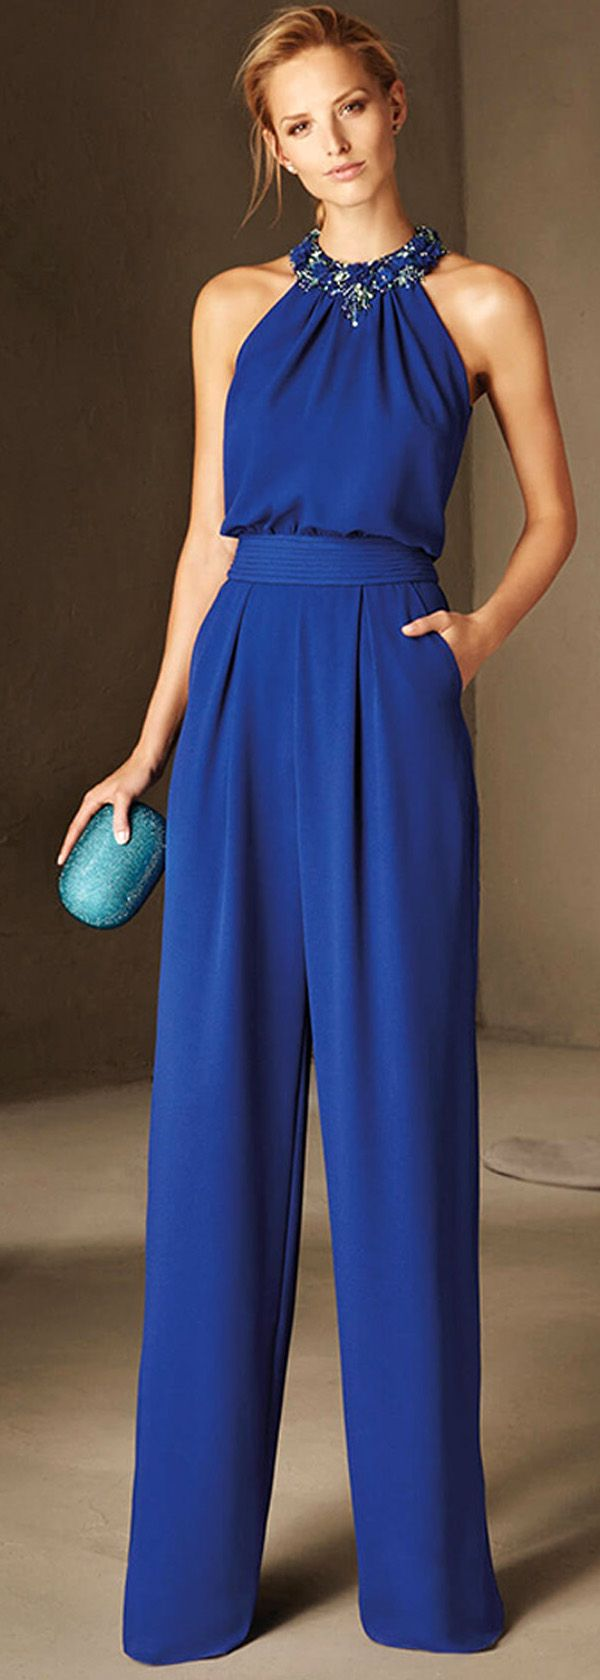 Attractive Chiffon Halter Neckline Full-length Evening Dresses More